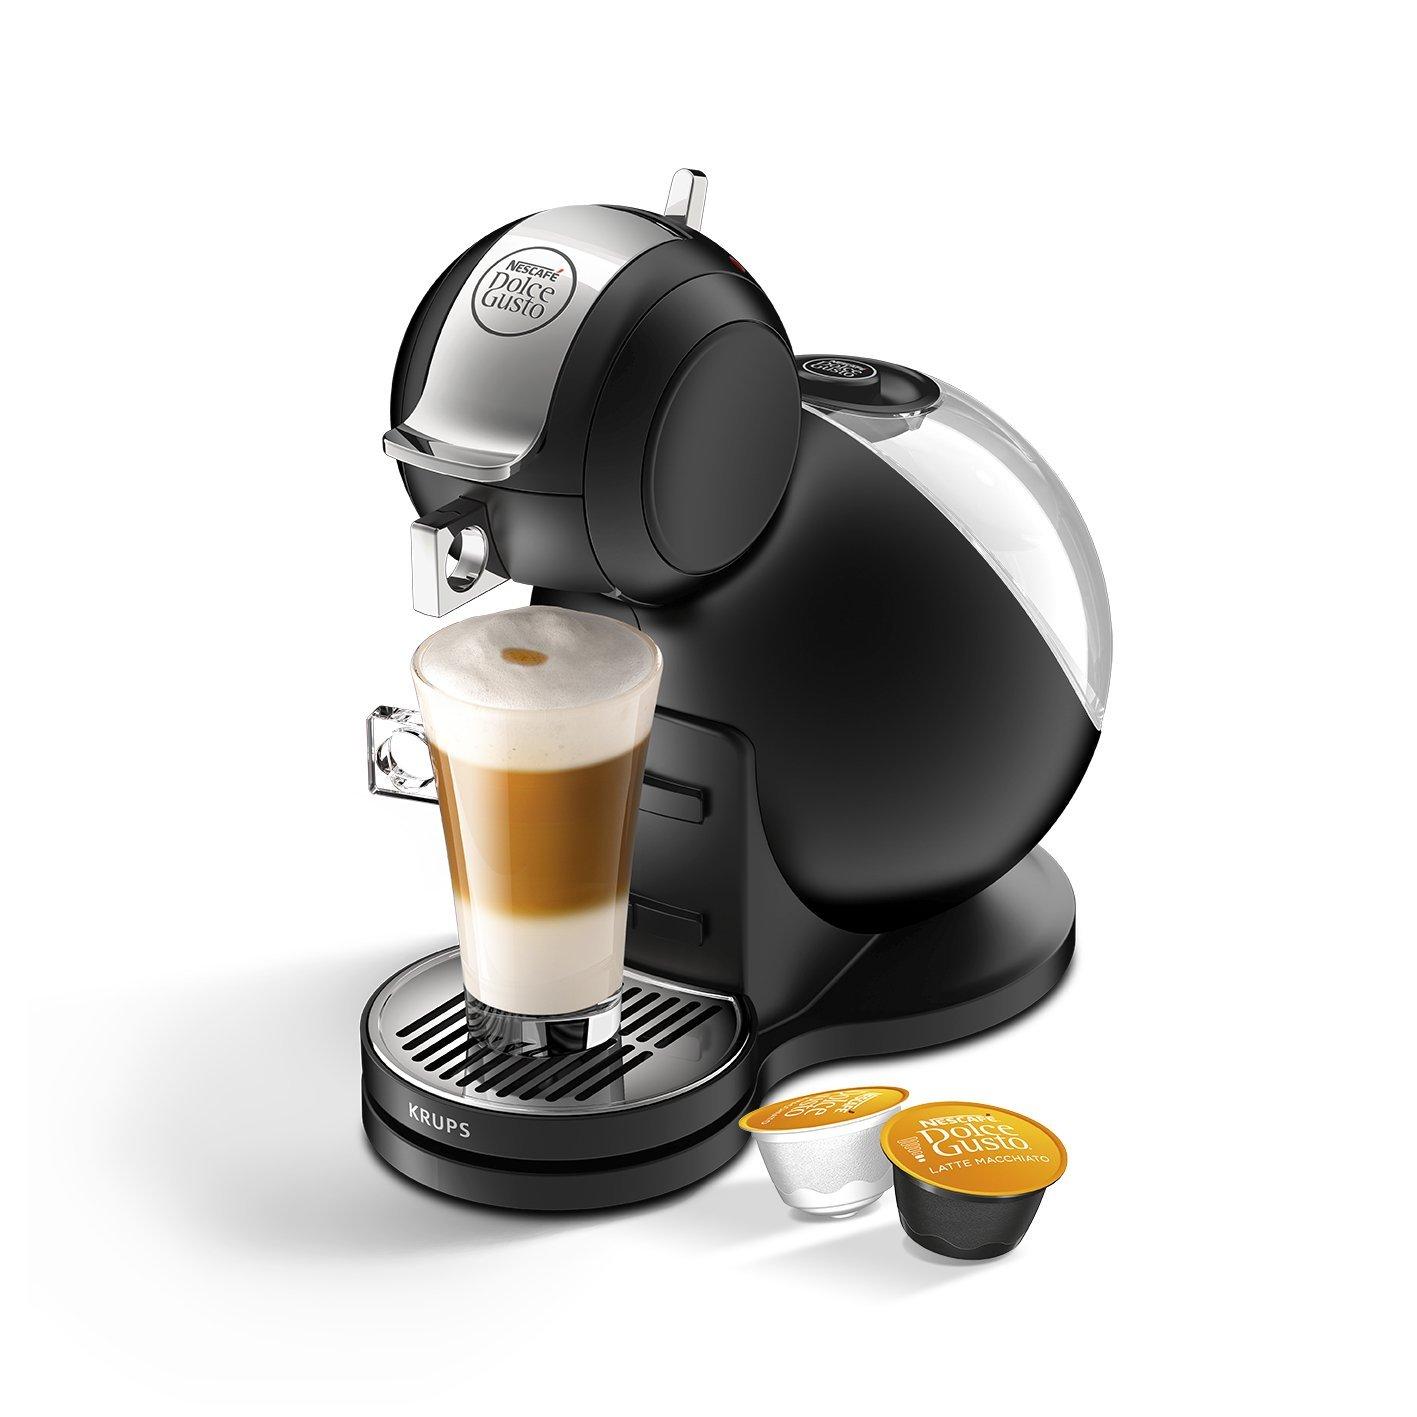 krups 452 coffee maker manual